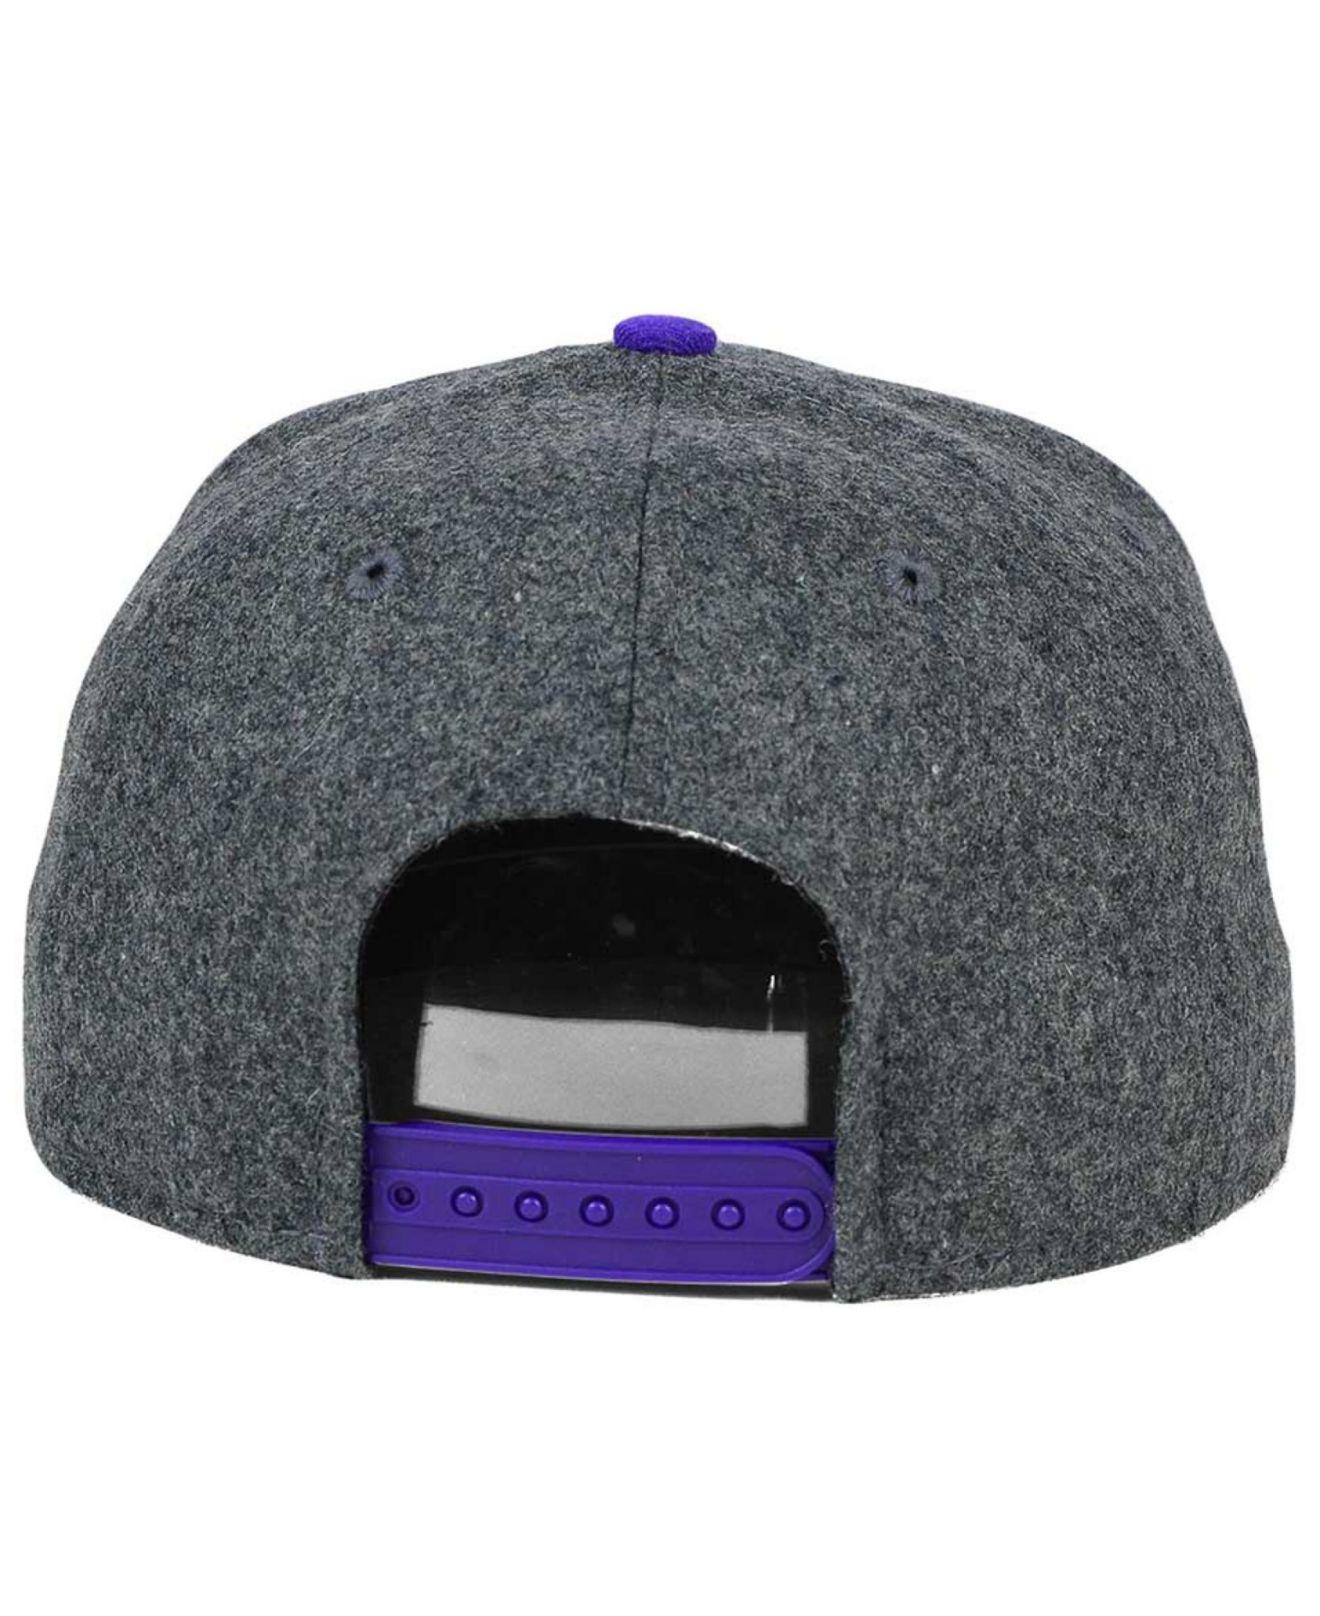 Lyst - Ktz Minnesota Vikings Shader Melt 9fifty Snapback Cap in Gray ... 295dafa31155